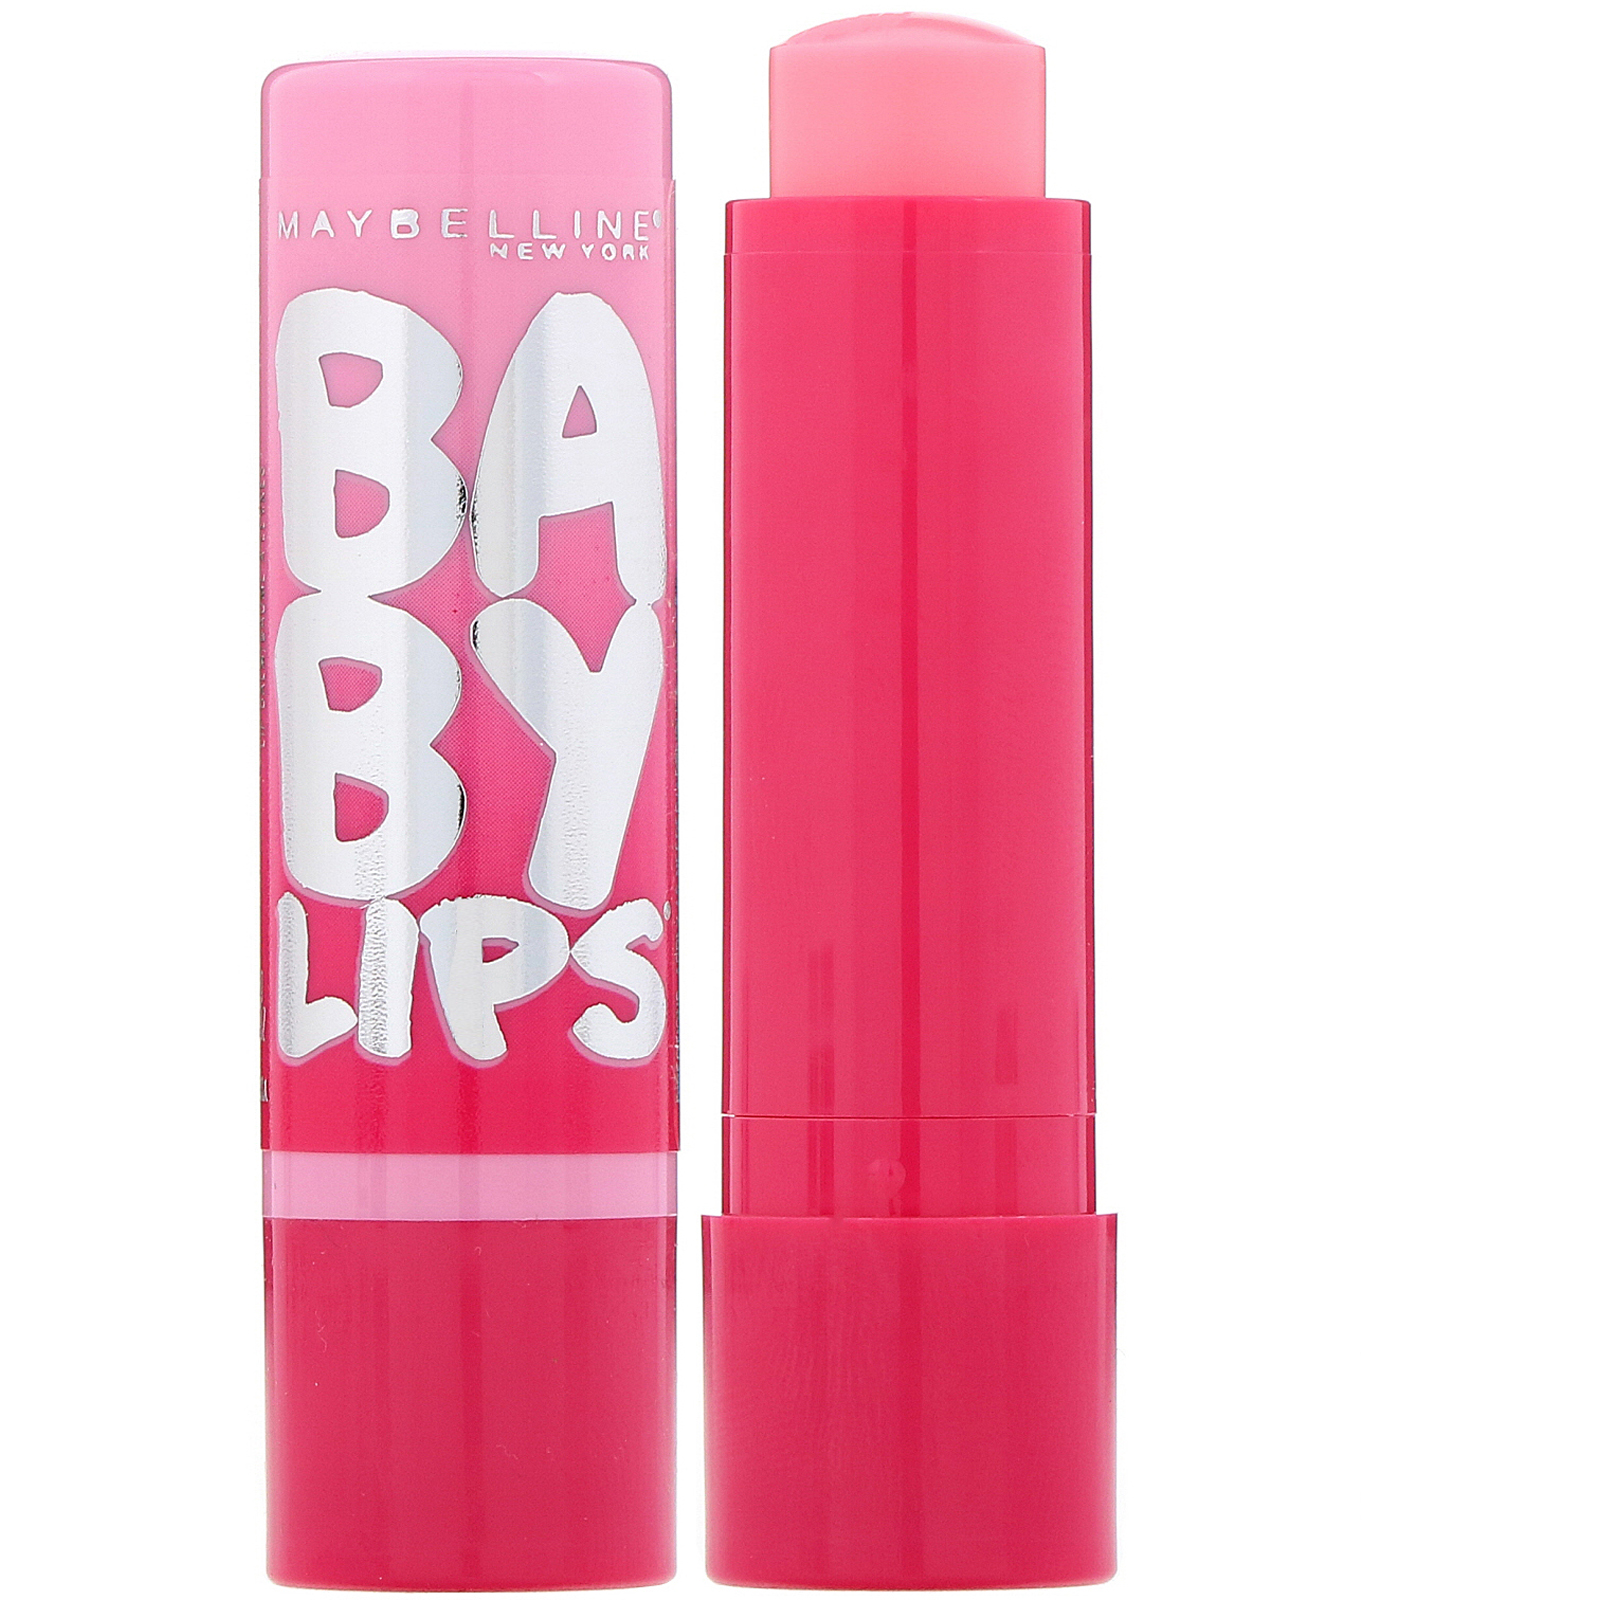 Maybelline, Baby Lips, Glow Balm, 01 My Pink, 0.13 oz (3.9